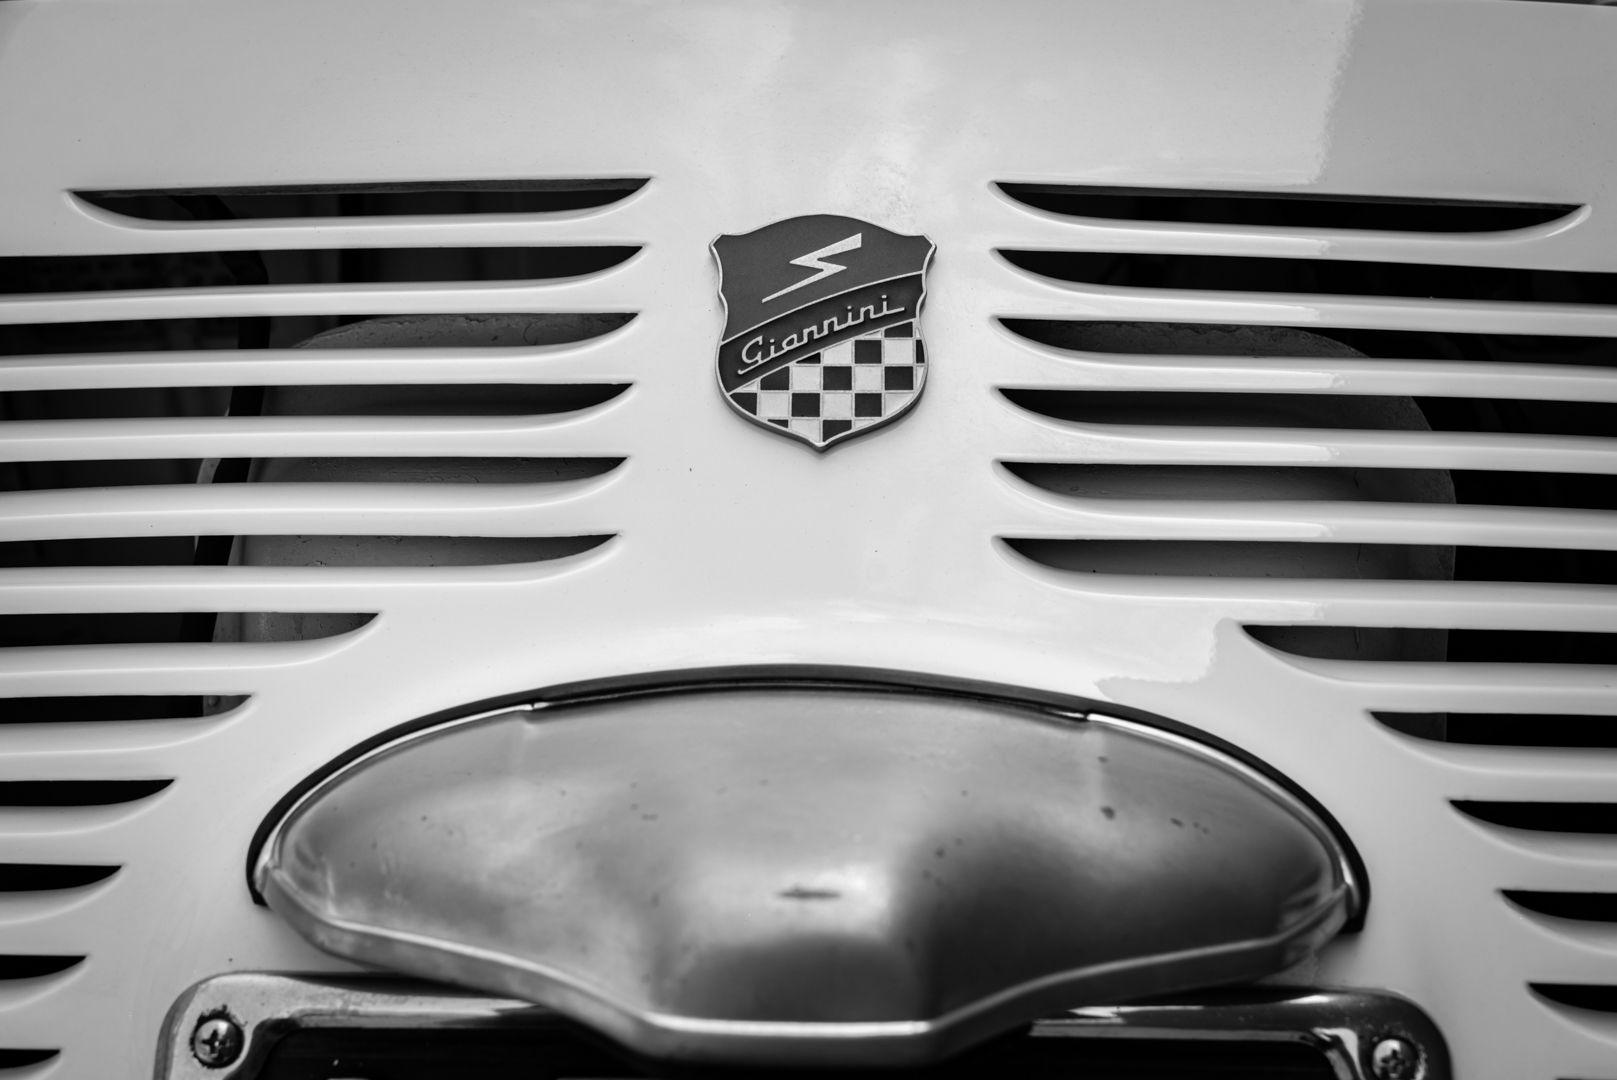 1968 Fiat Giannini 750 TV Turismo Veloce 77091